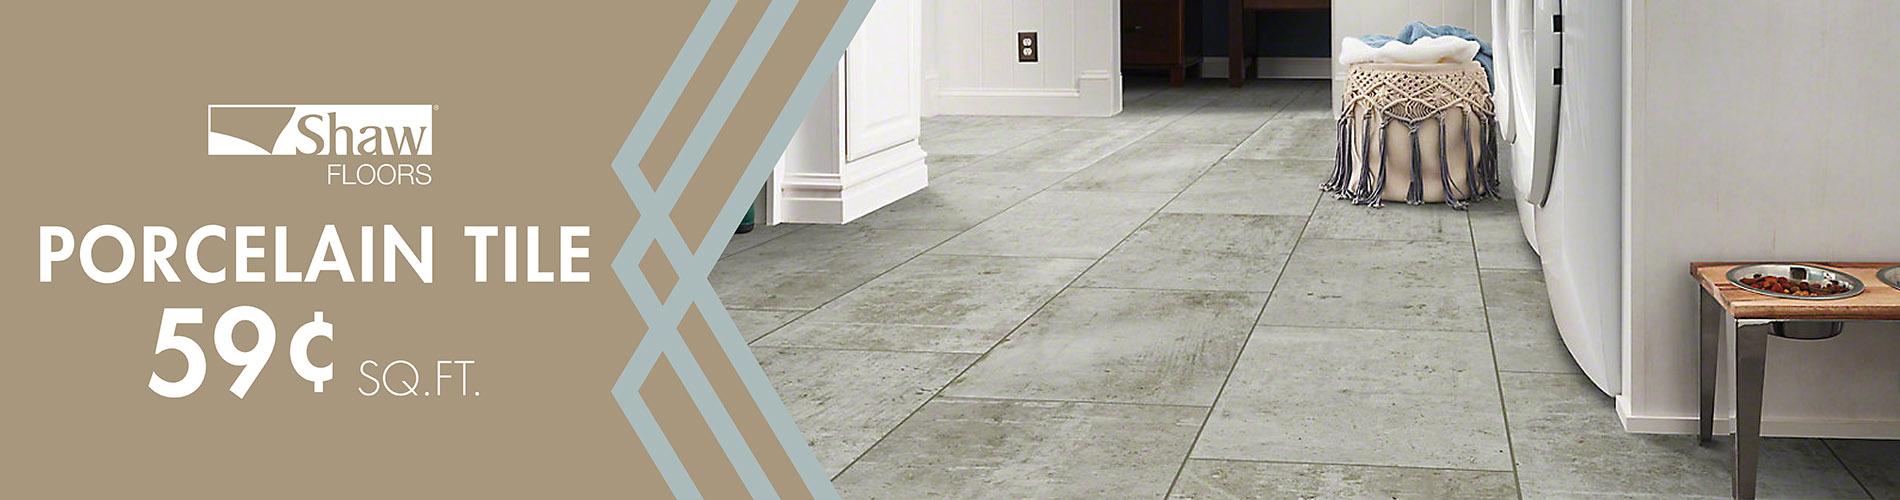 Shaw Floors porcelain tile only $.59 sq. ft.